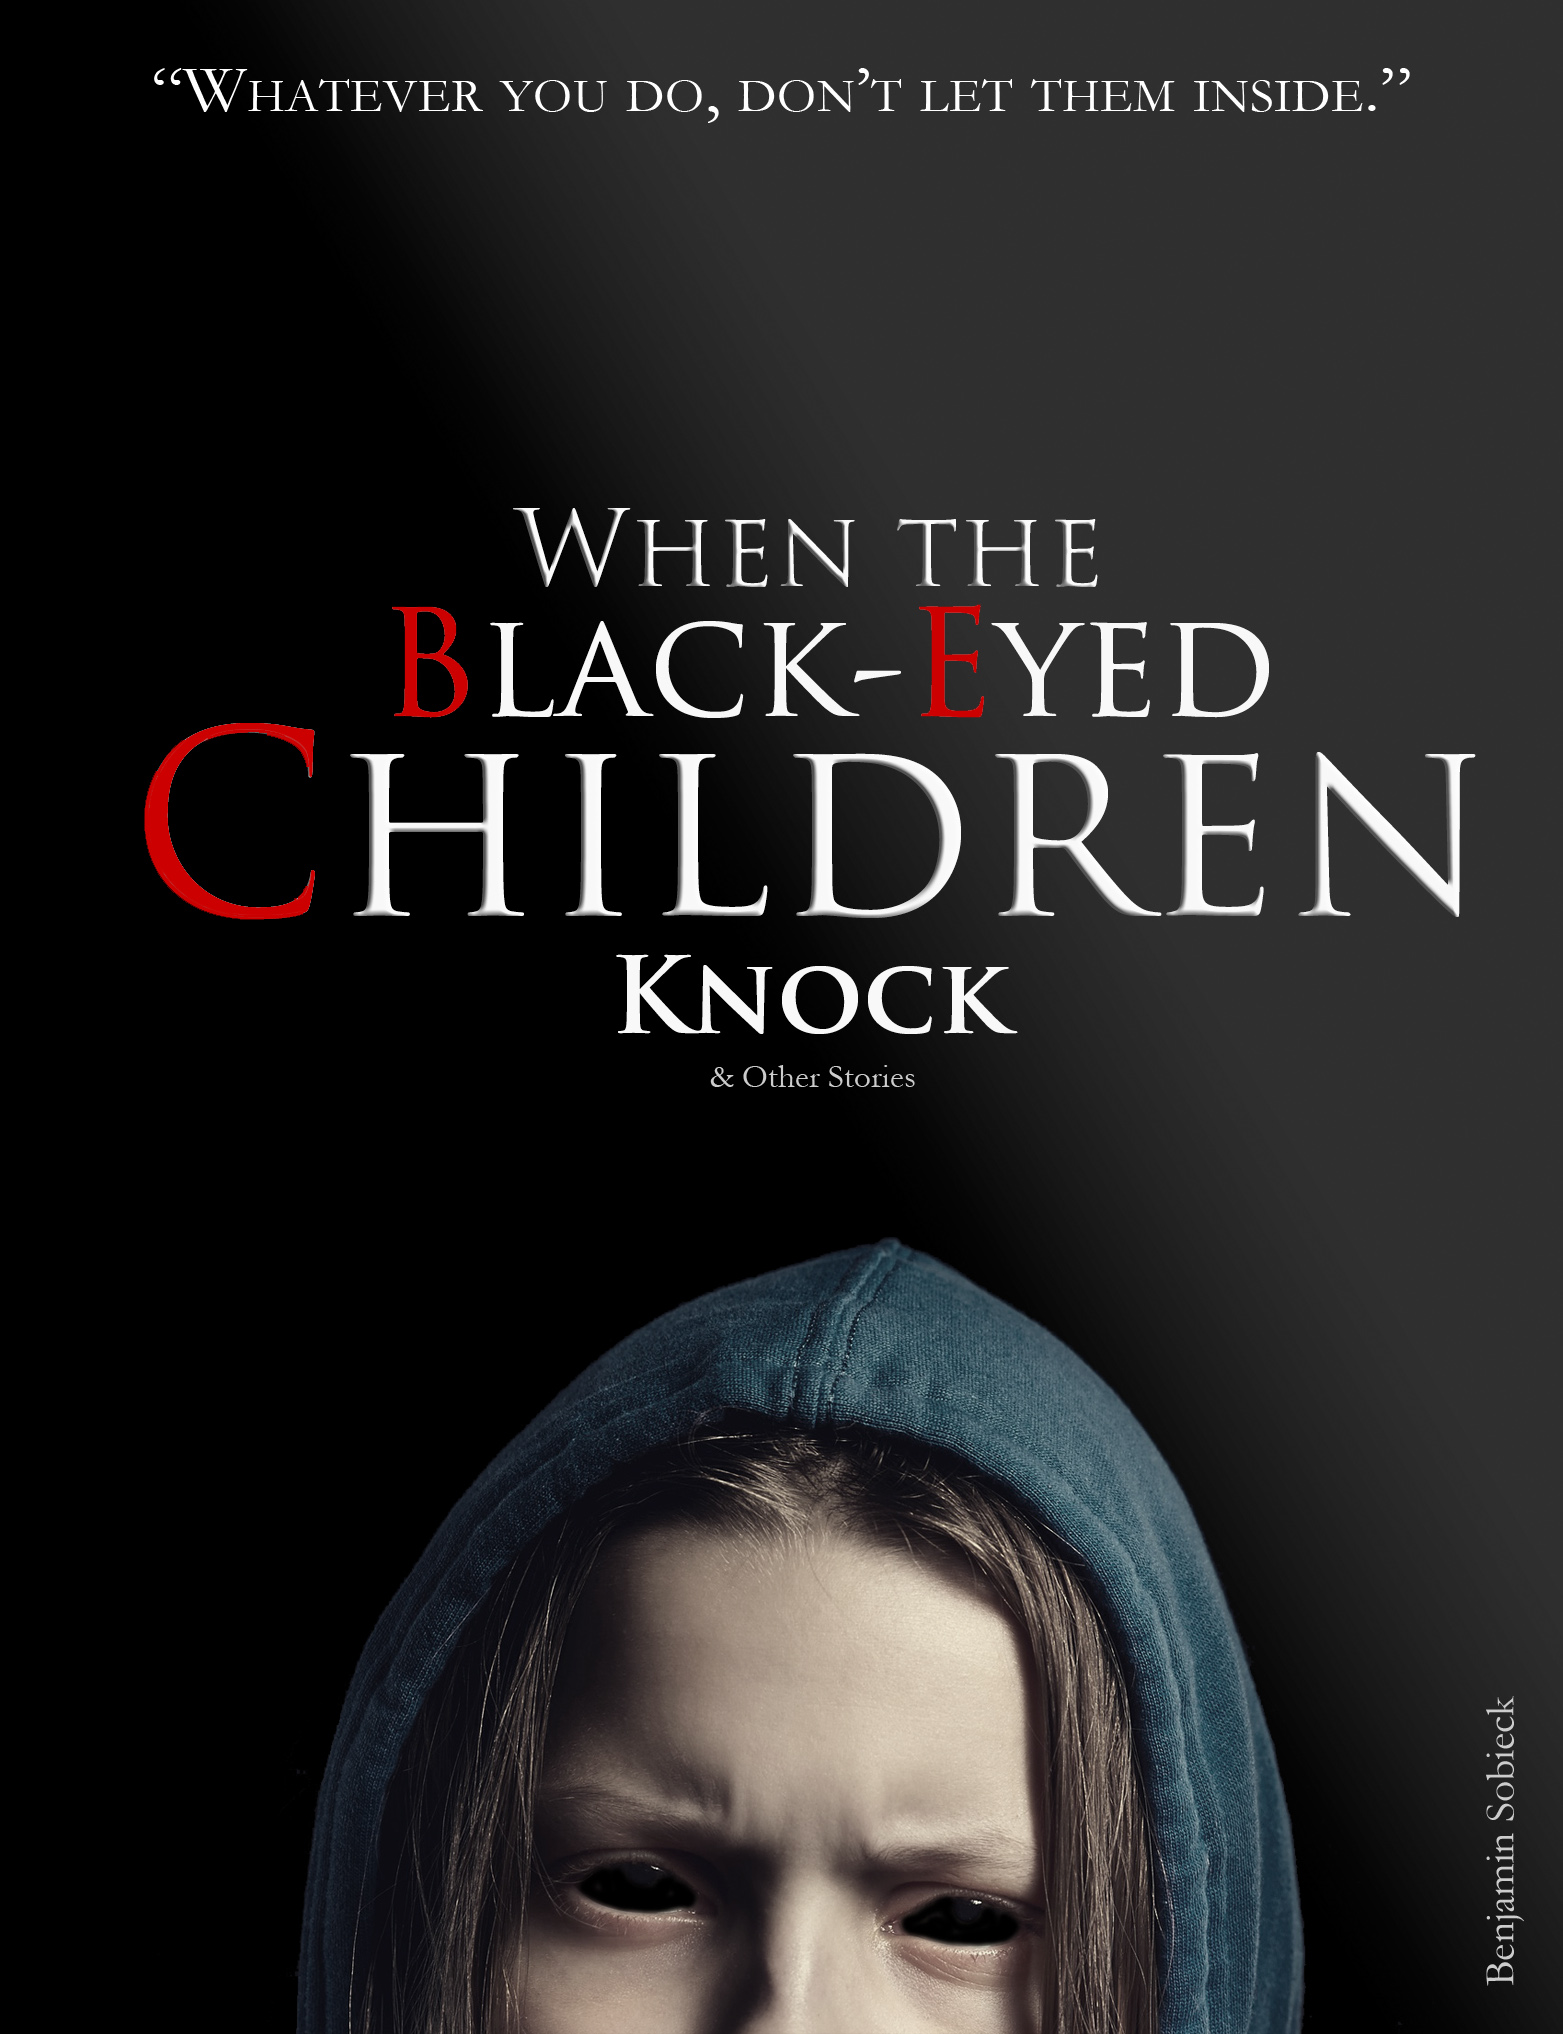 Black-Eyed Kids Story